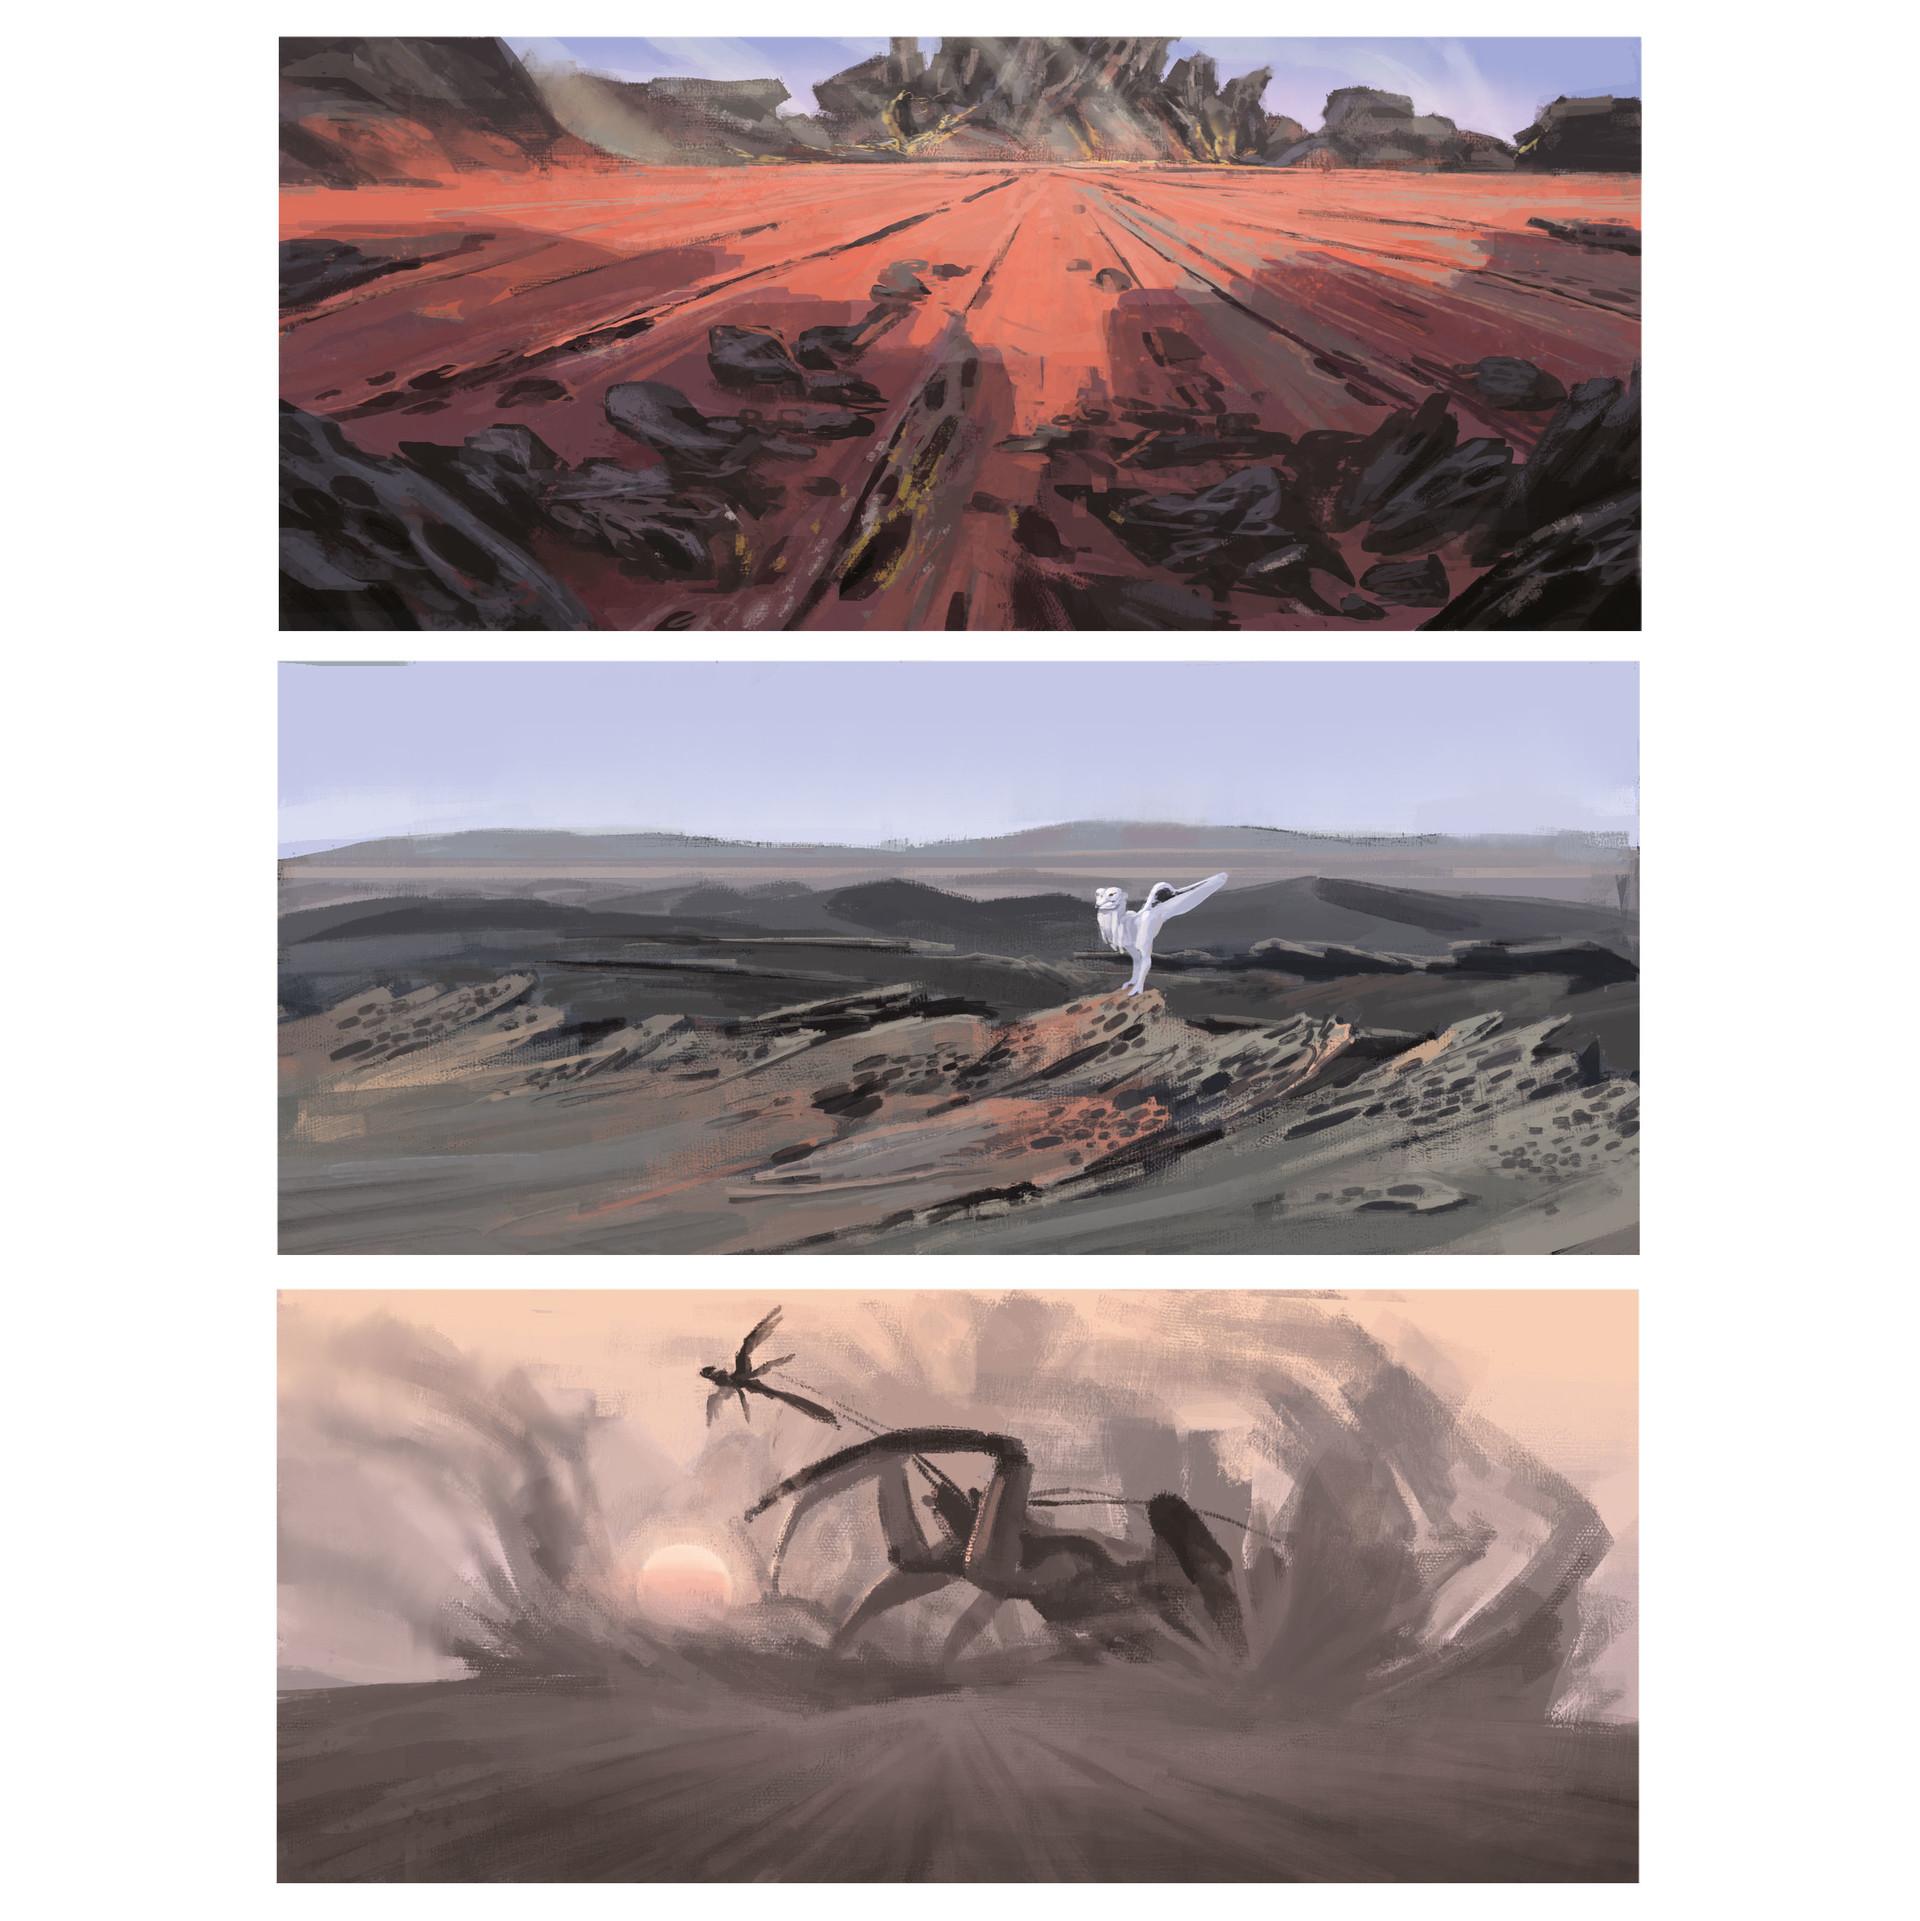 [Reflexion] Les oeuvres qui vous inspirent Alexander-ostrowski-05-desert-colorroughs-insta2